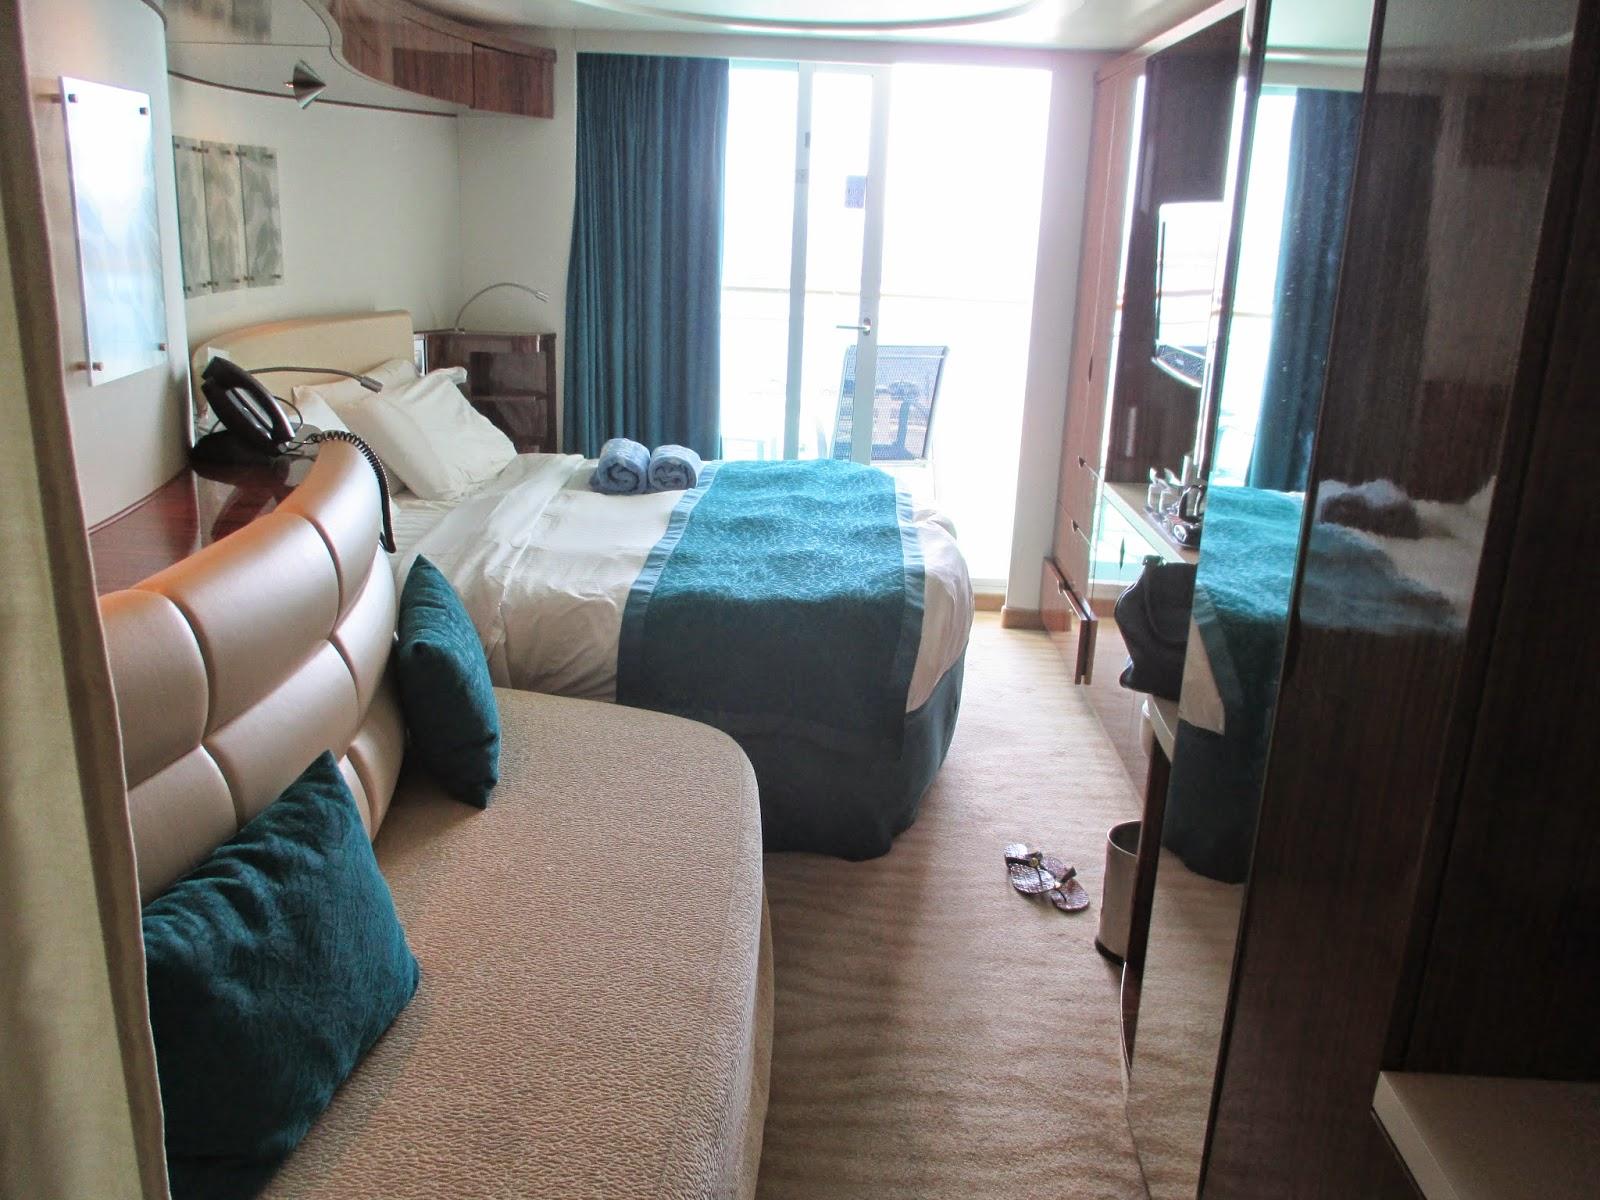 norwegian epic balcony room photos Mediterranean Cruise On Norwegian Epic Green Fashionista